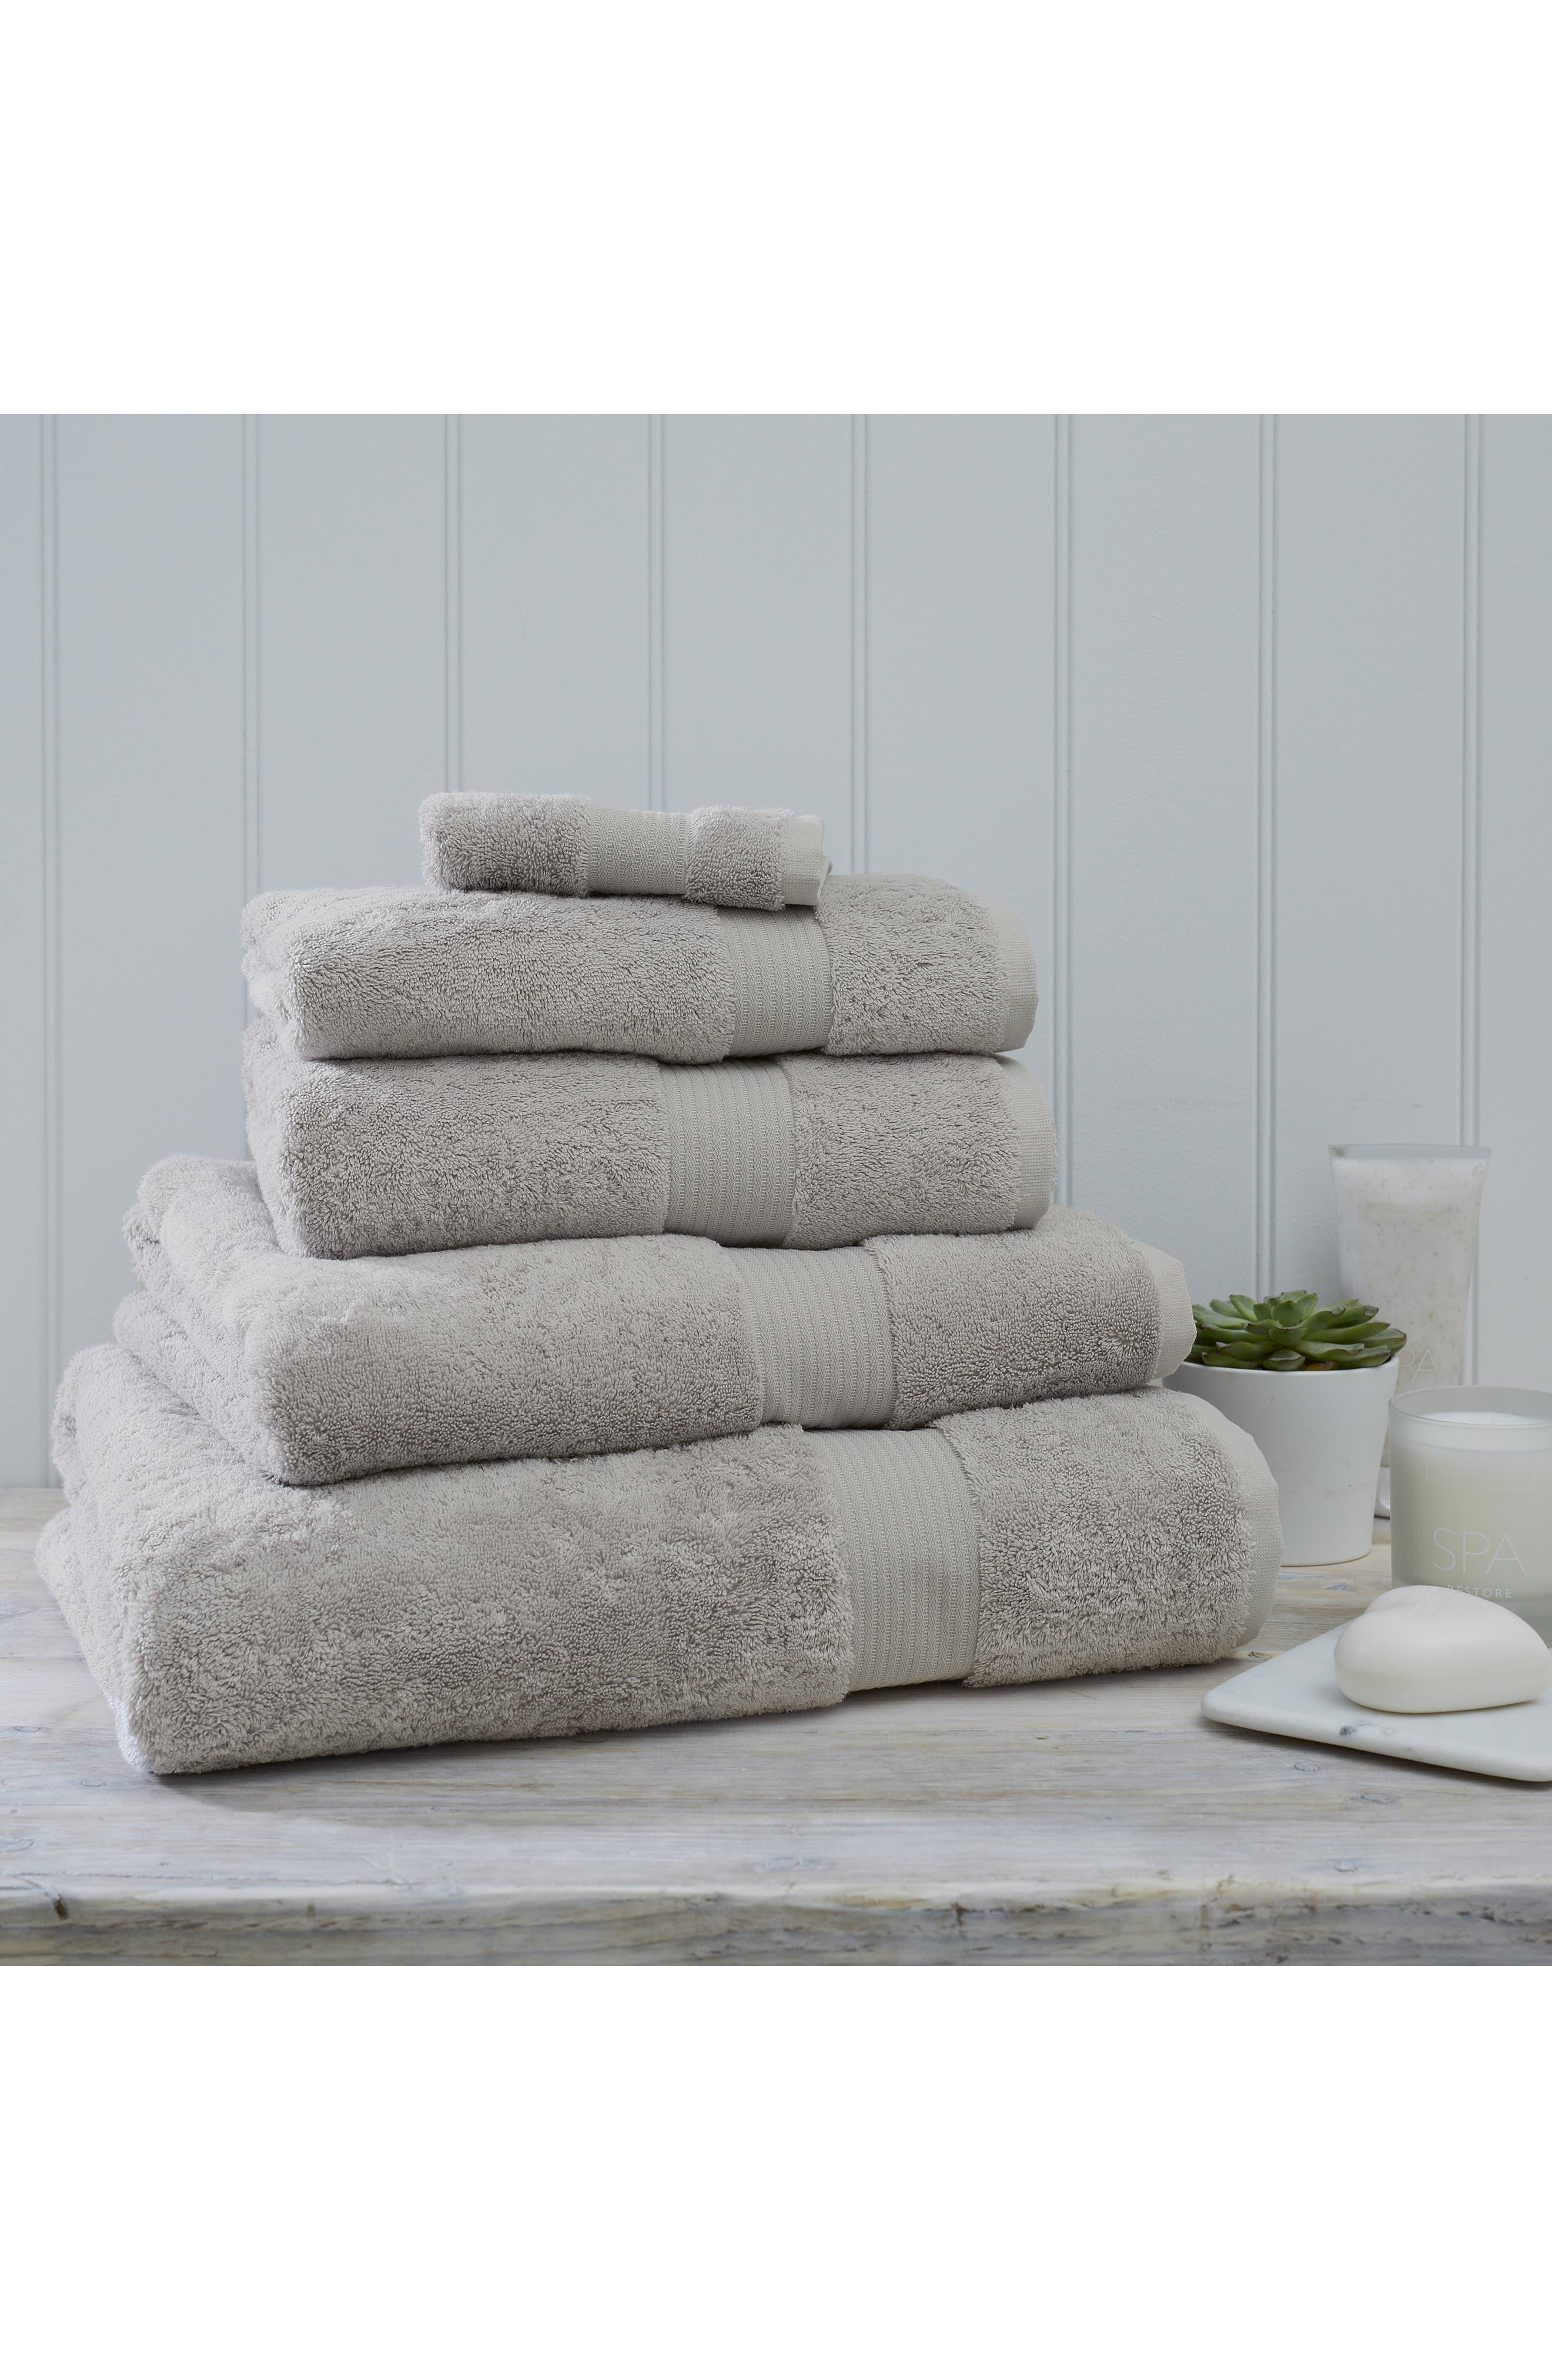 Luxury Egyptian Cotton Bath Sheet,                             Main thumbnail 1, color,                             PEARL GREY